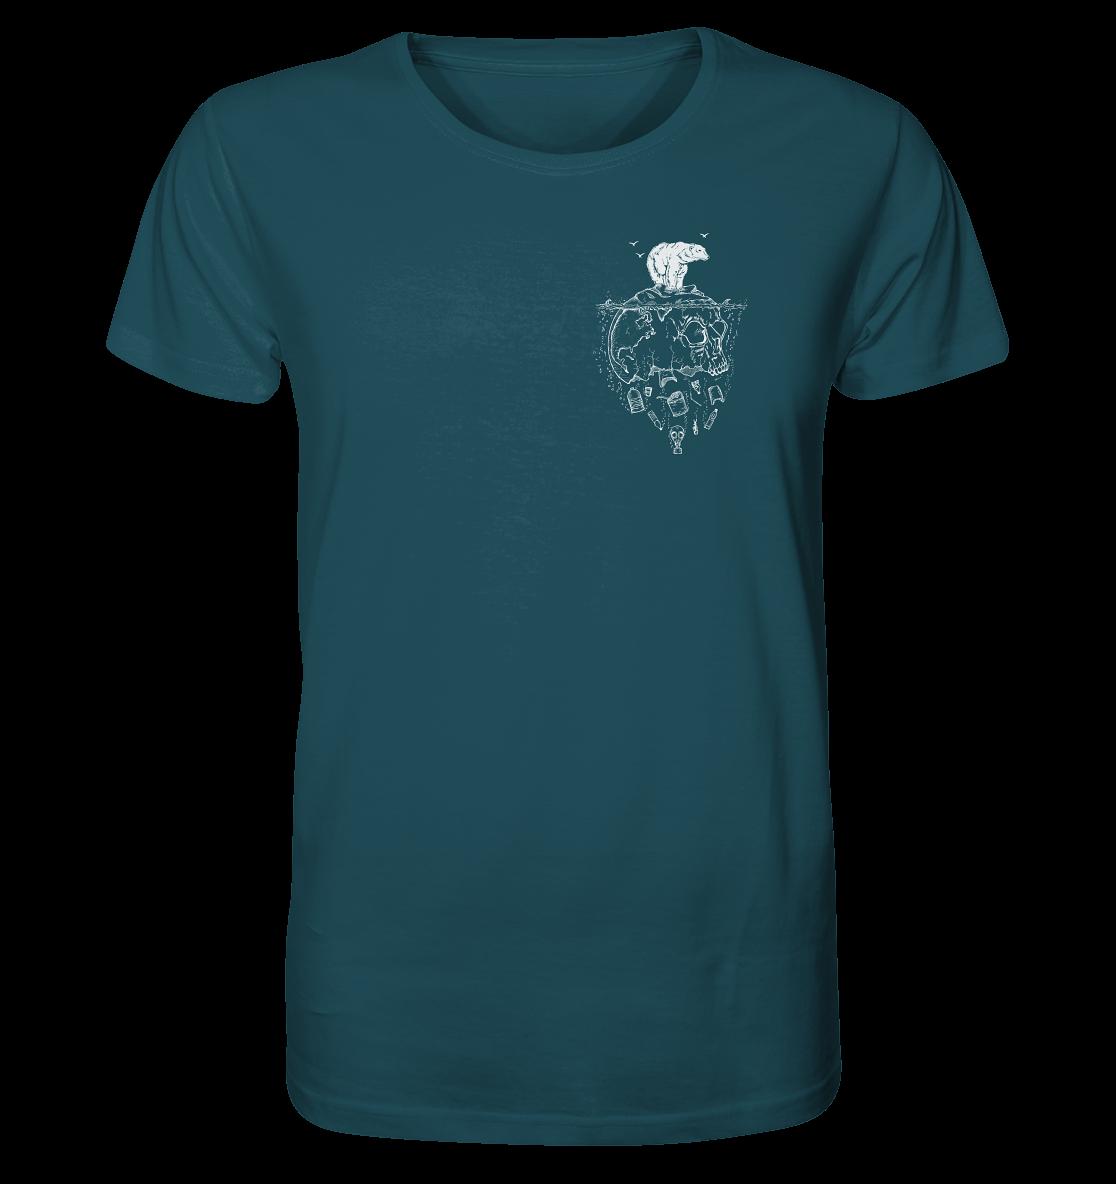 front-organic-shirt-204d59-1116x-16.png